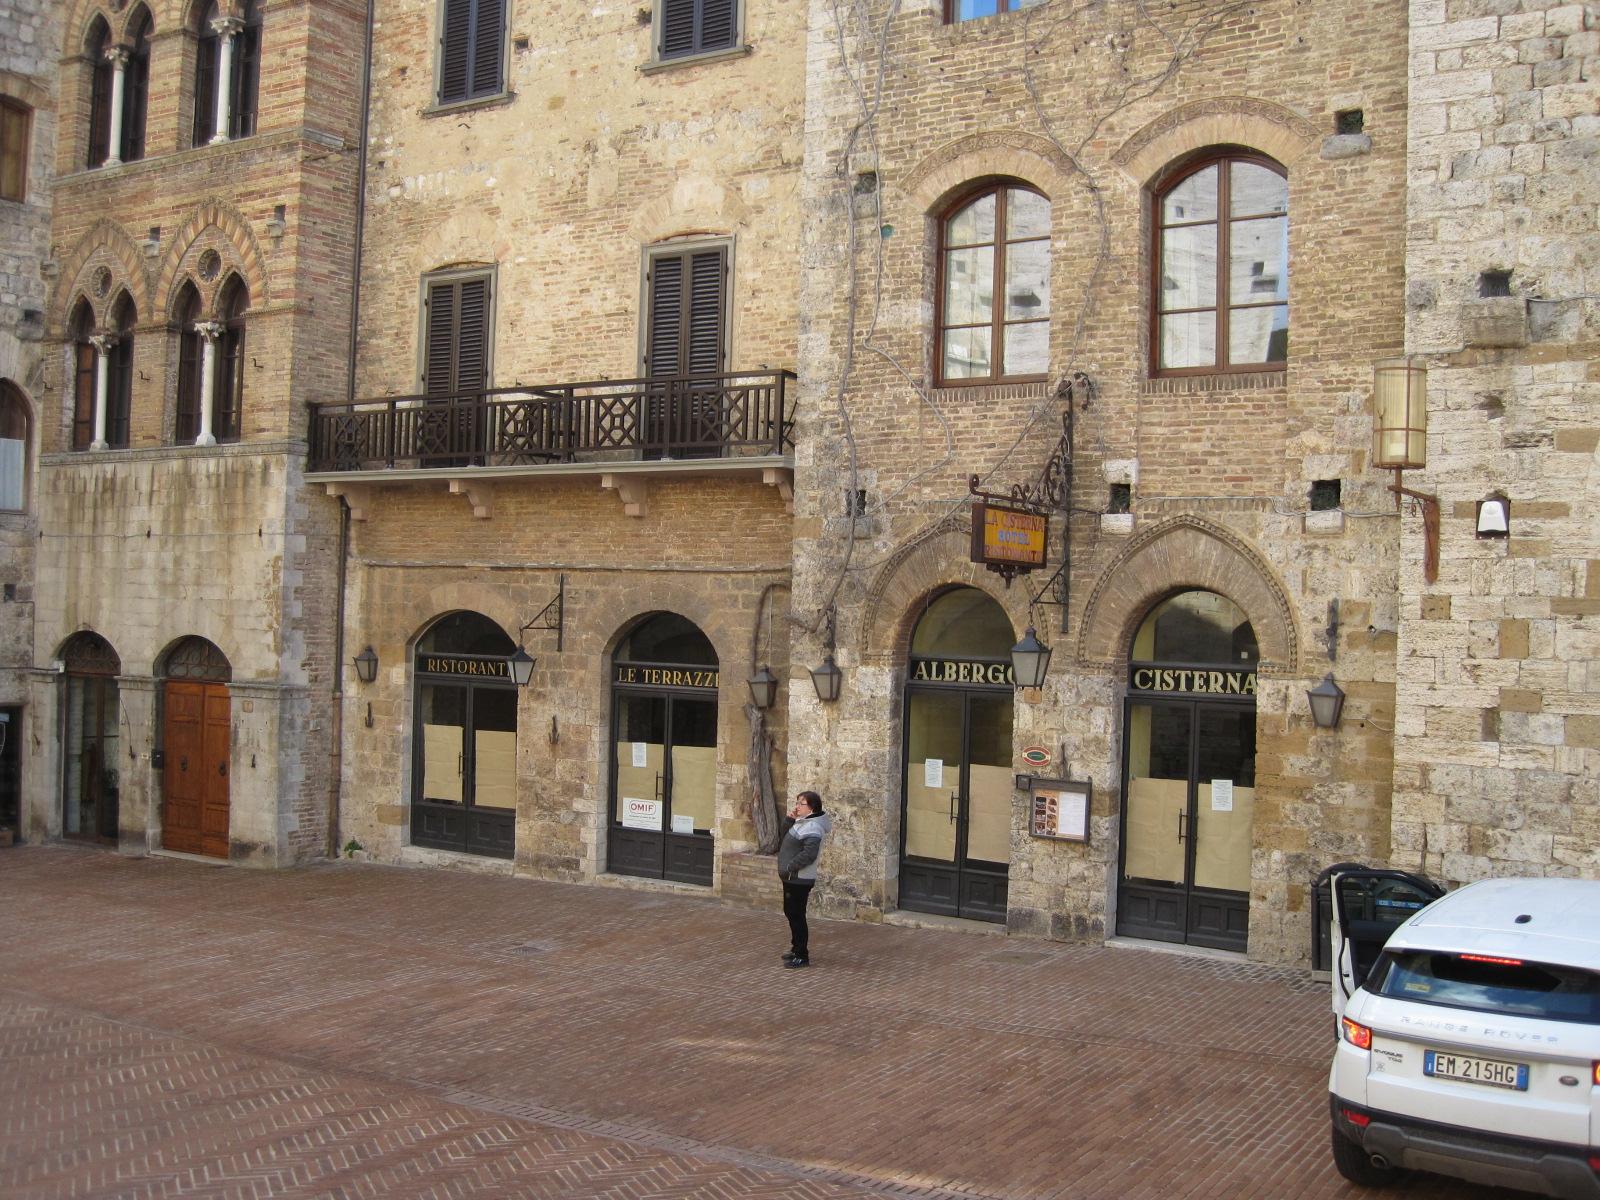 Albergo La Cisterna in the main square in San Gimignano. A great location. (A D Kay)